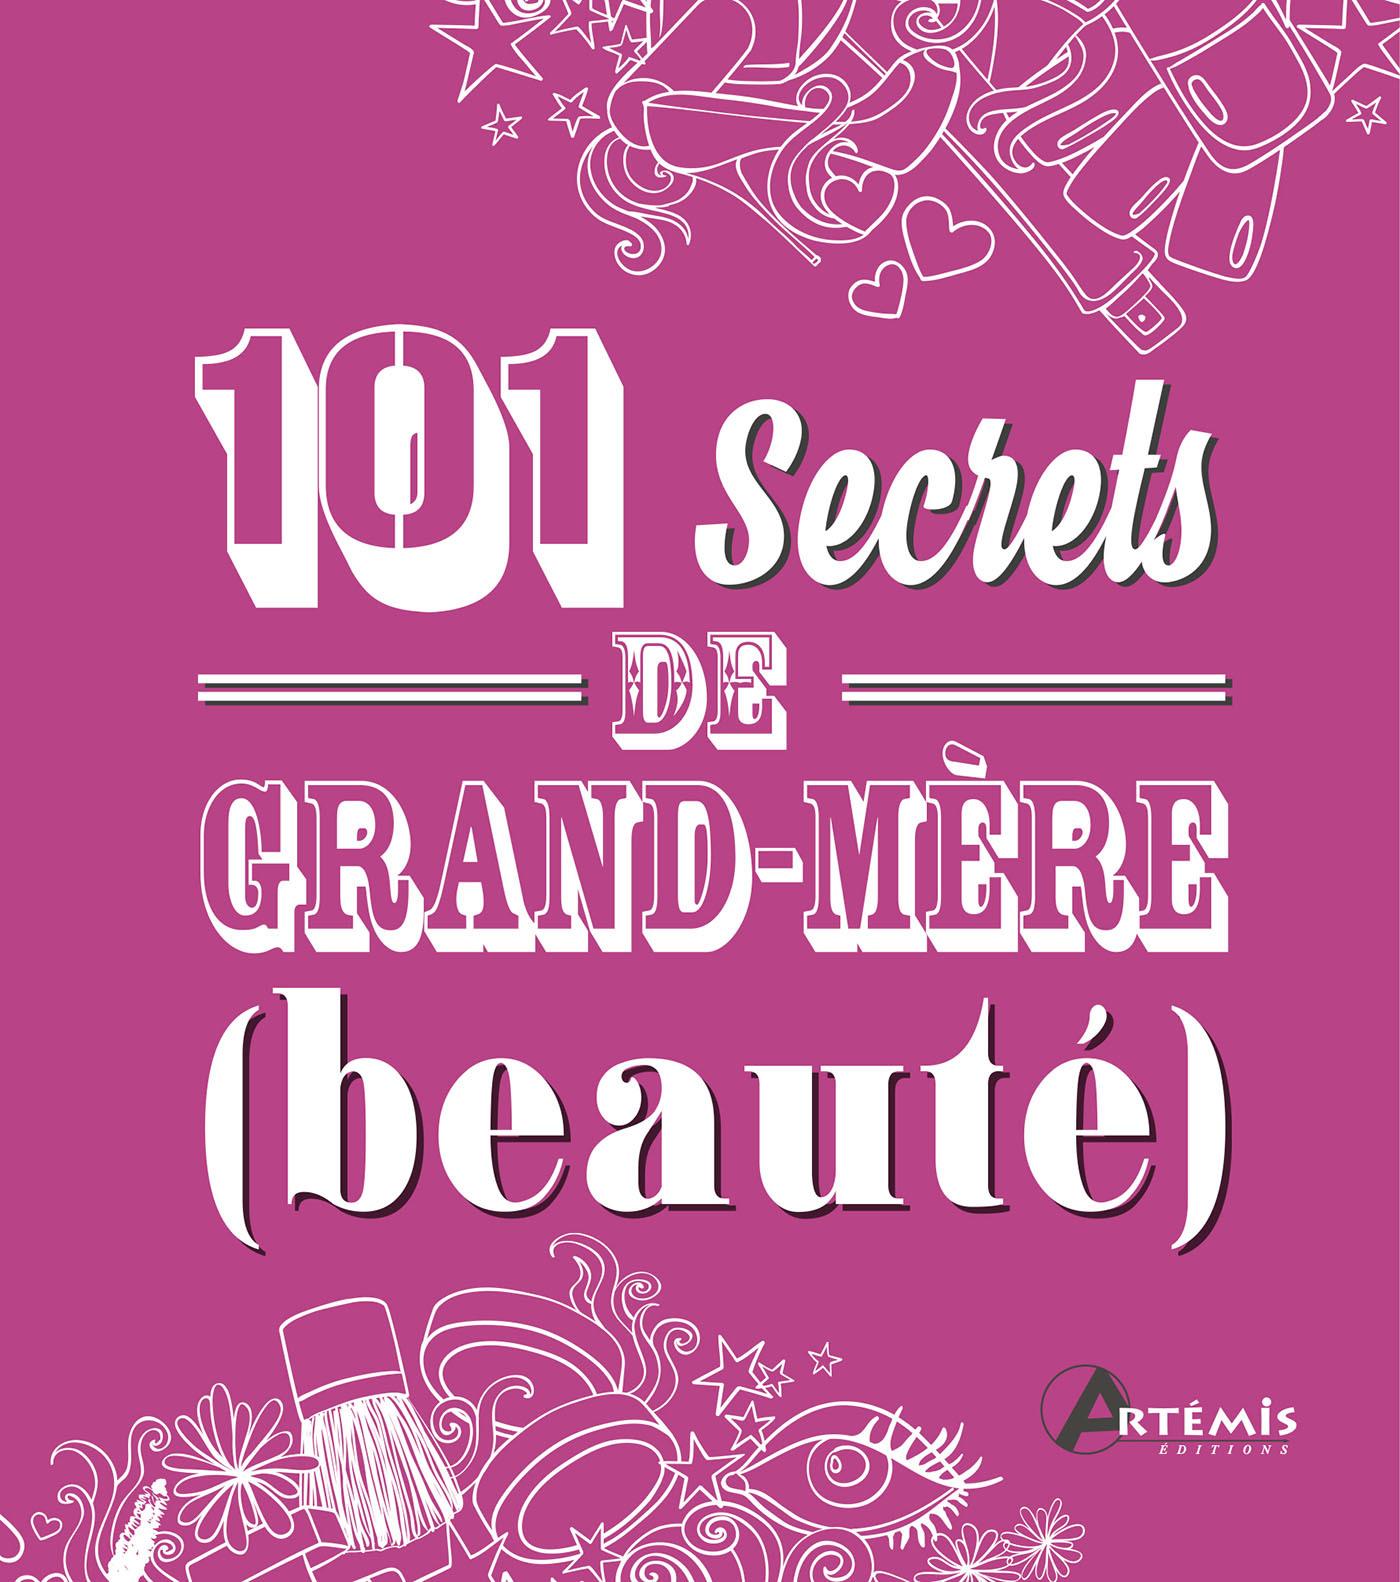 101 SECRETS DE GRAND-MERE BEAUTE